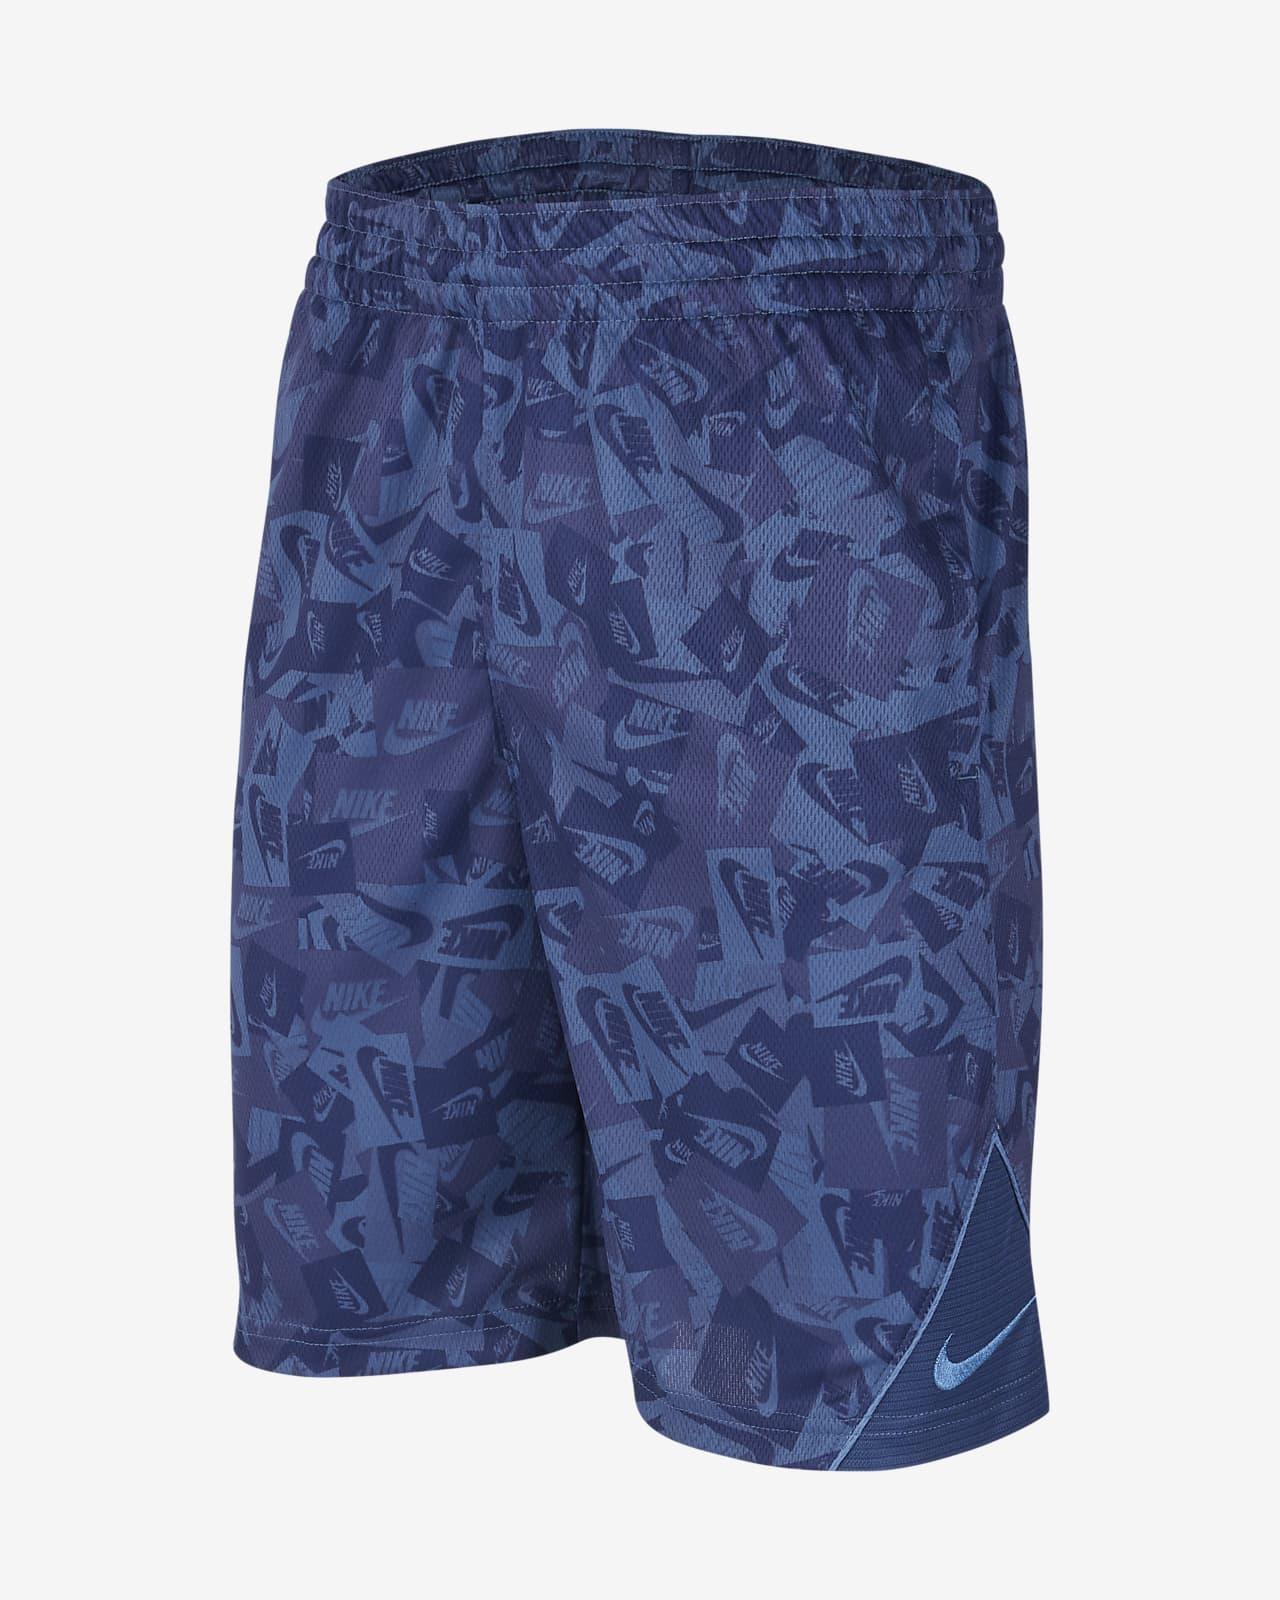 Shorts de básquetbol estampados para niño talla grande Nike